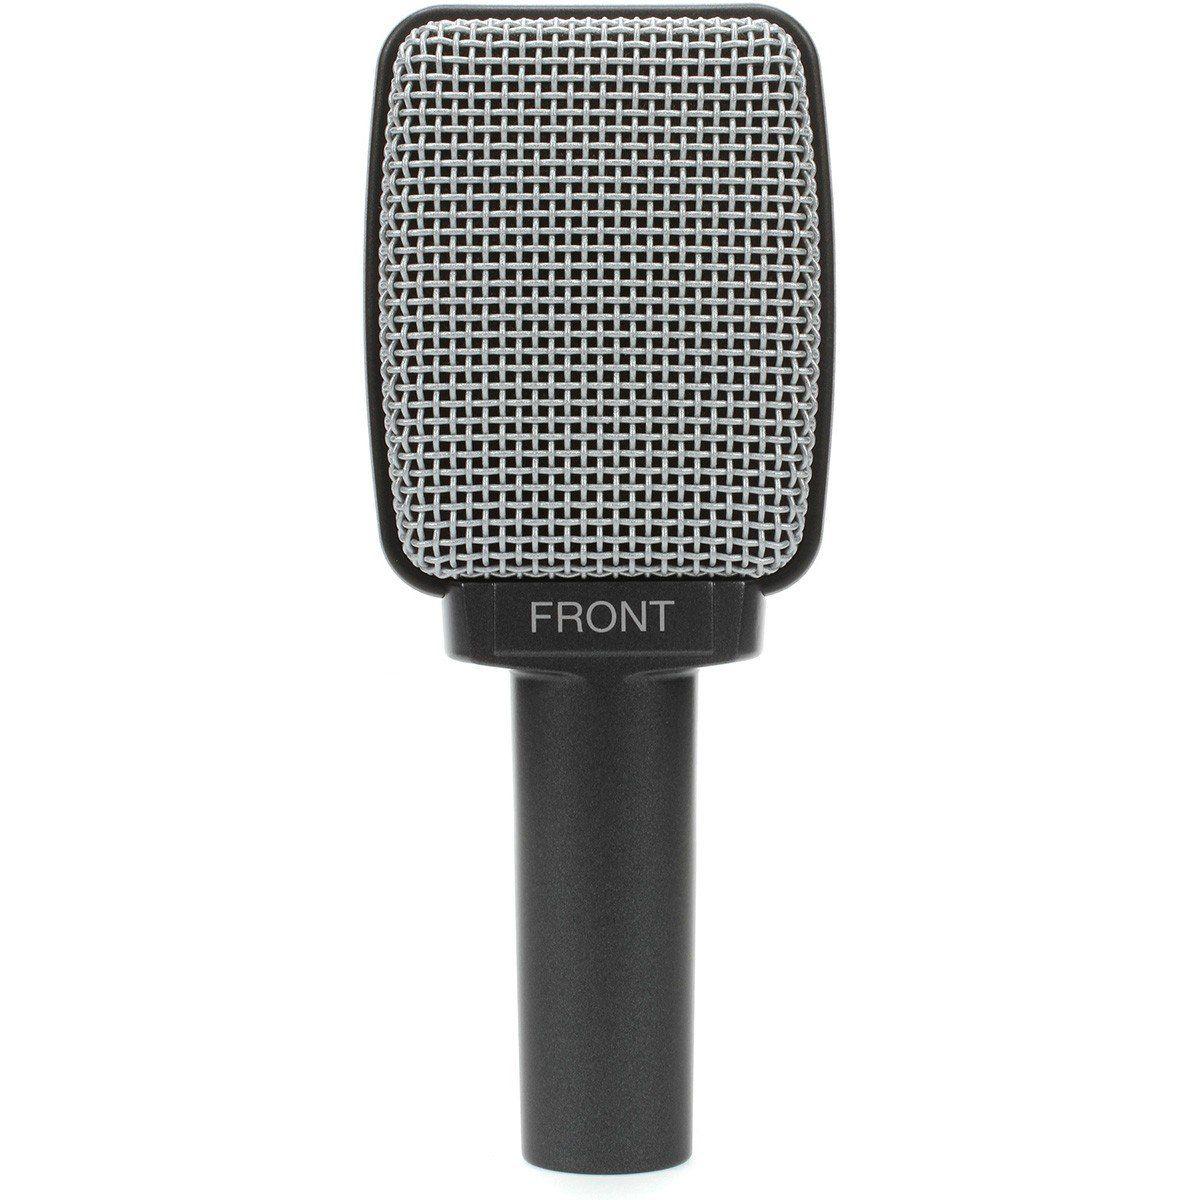 Sennheiser E609 Microfone Supercardióide Sennheiser-E609  Prata para Instrumentos